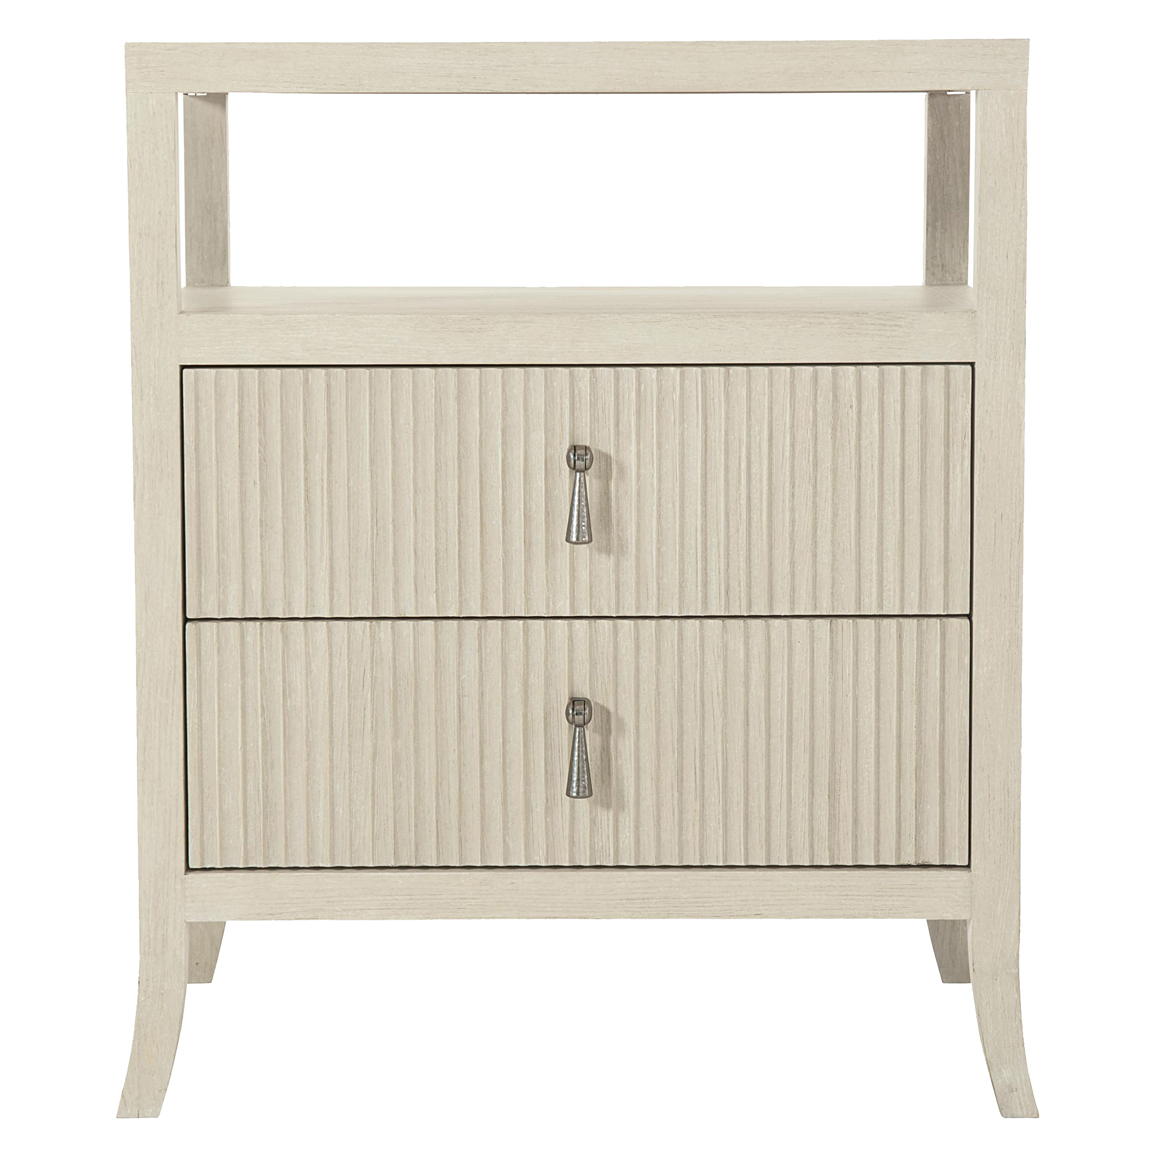 Alice Modern Classic Beige Two Drawer Open Top Shelf Nightstand